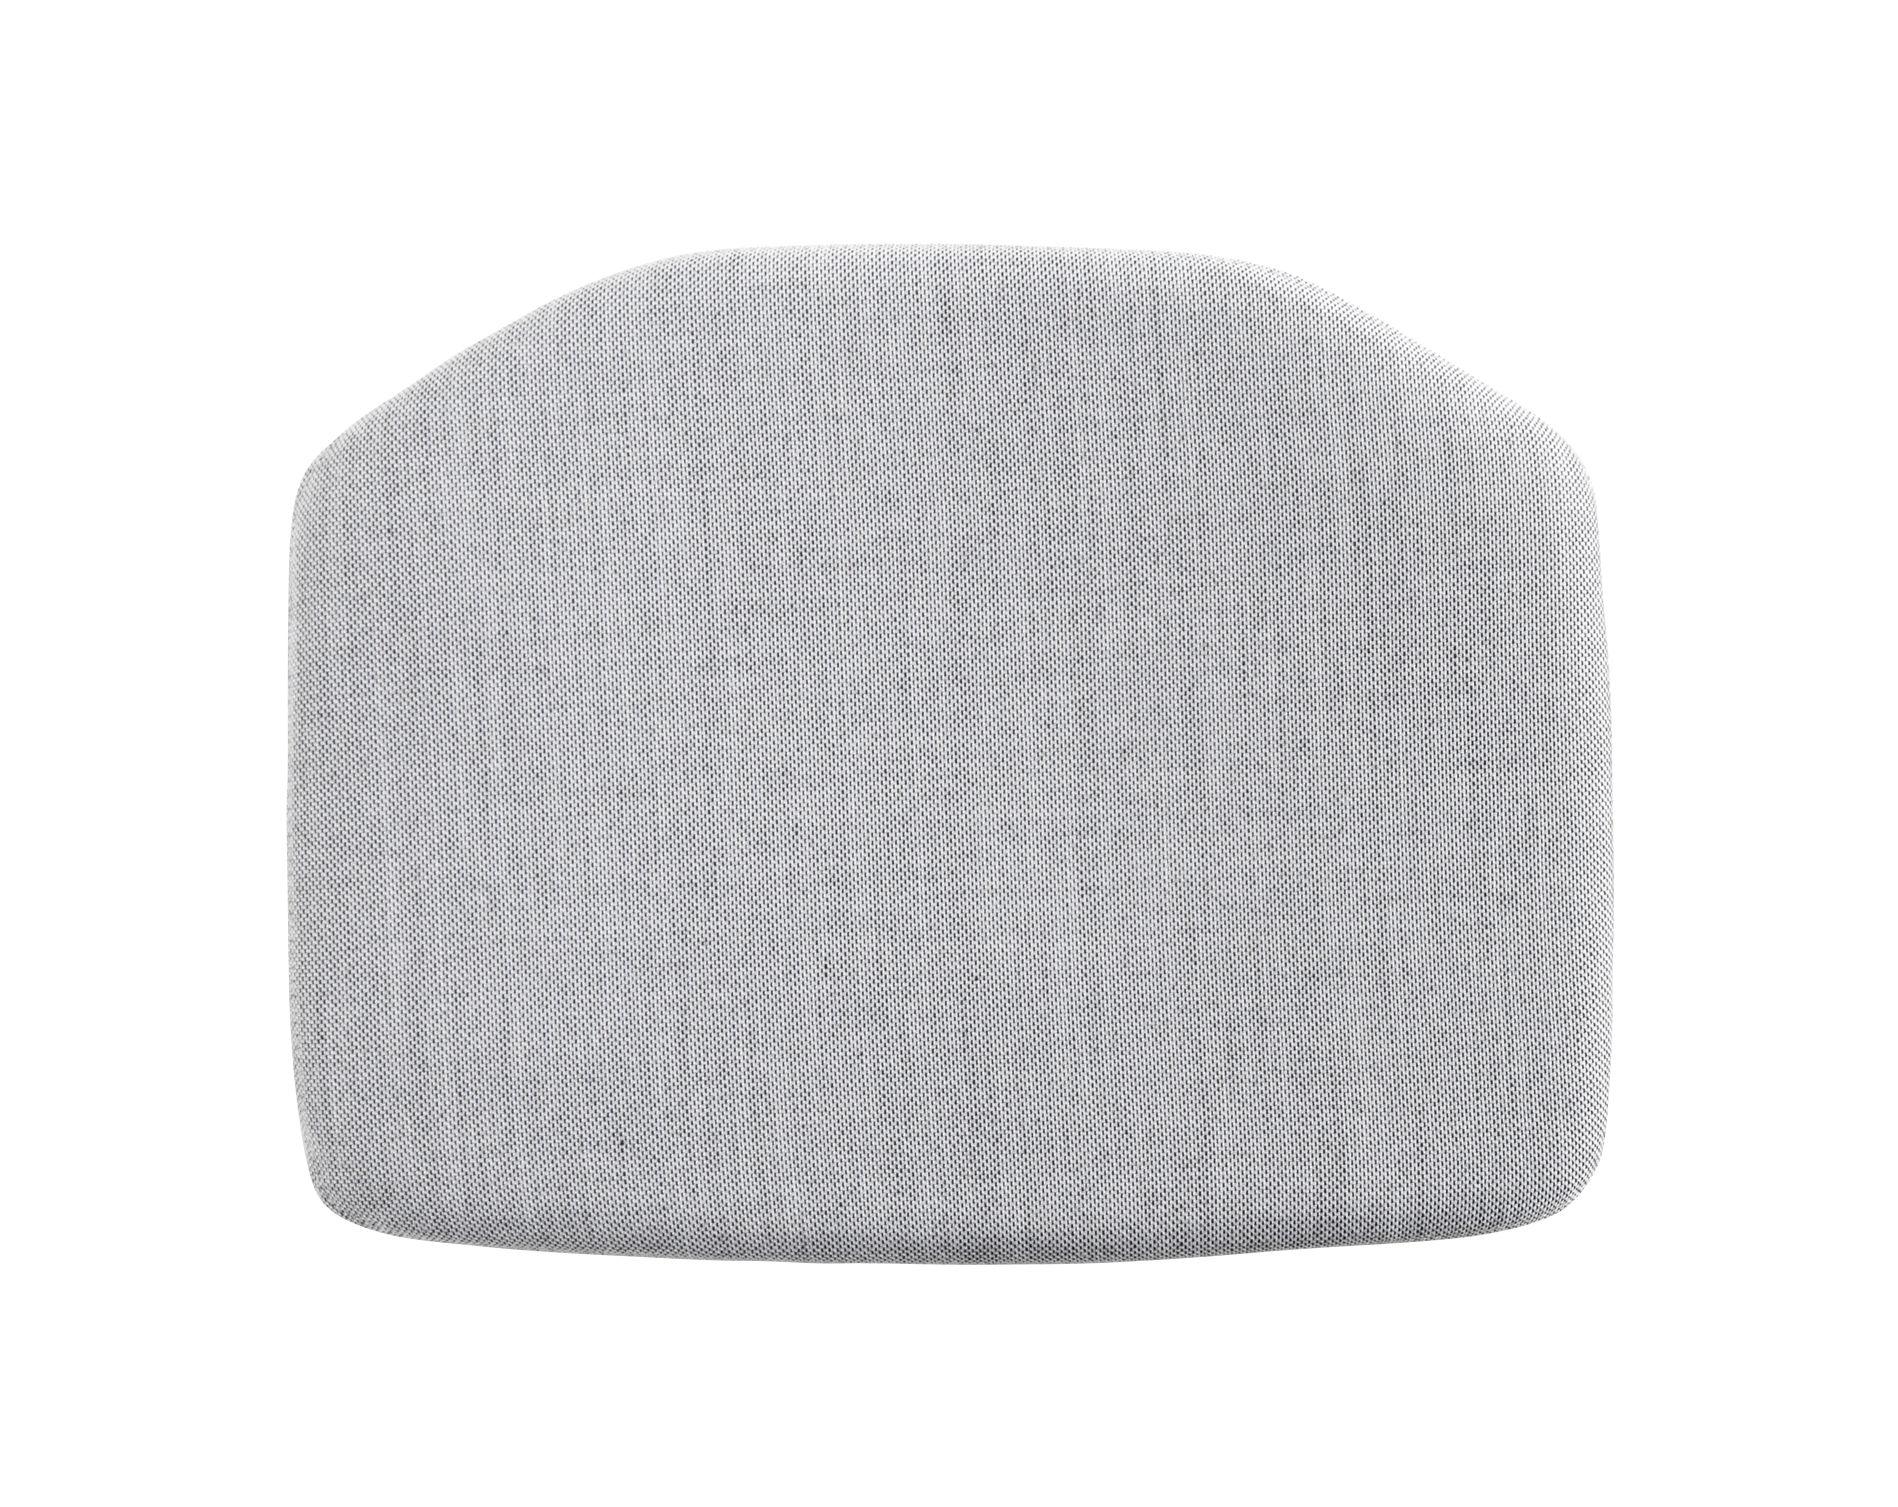 Hay Seat cushion - Grey | Made In Design UK